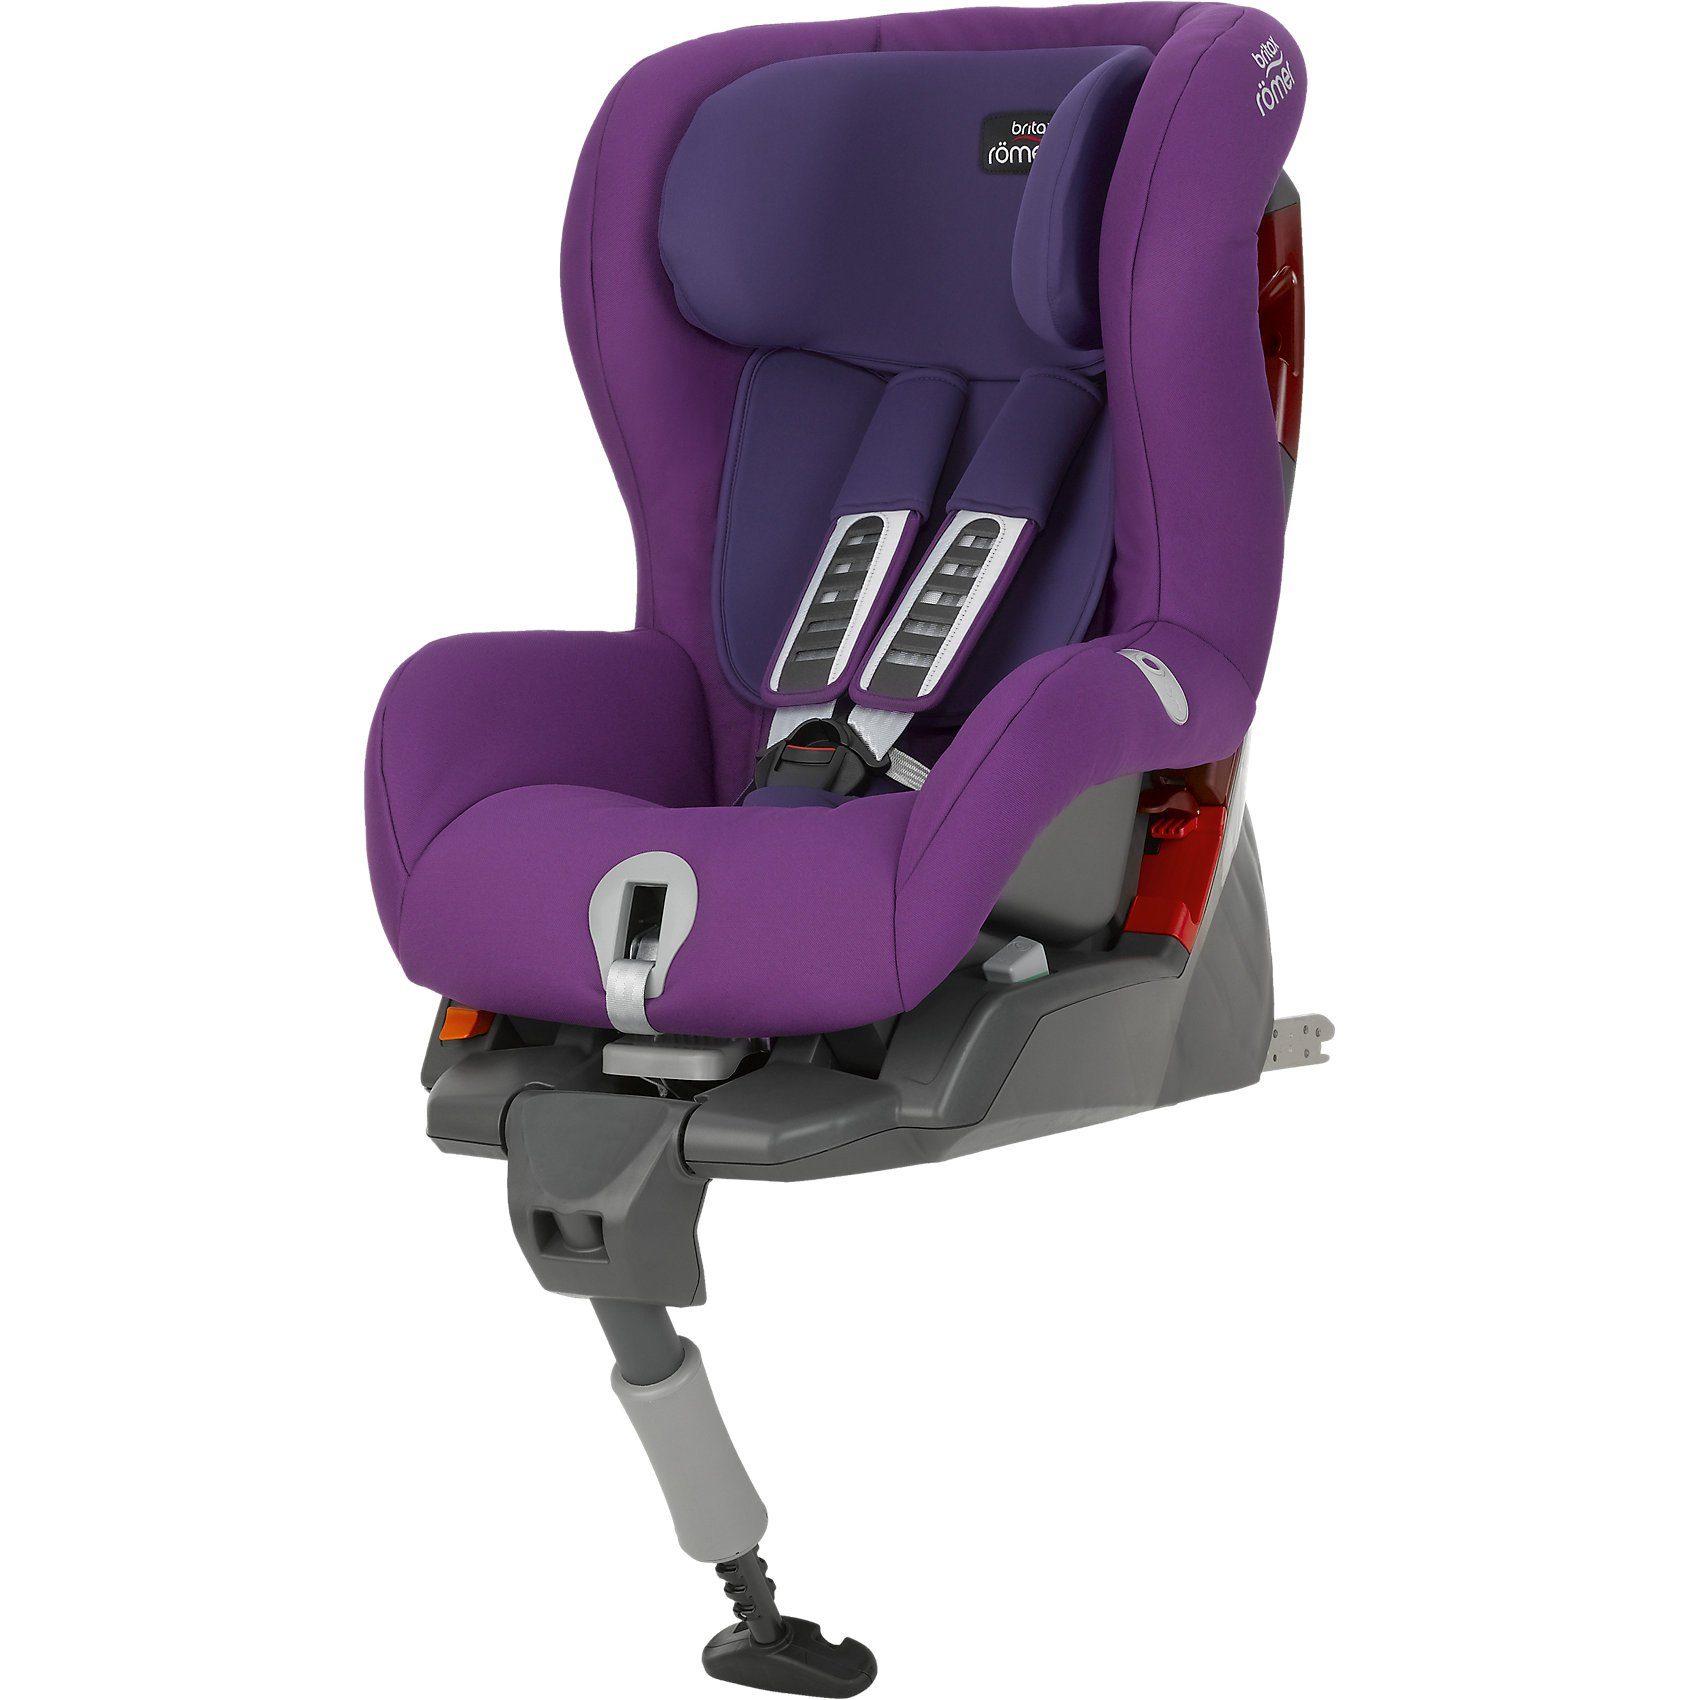 Britax Römer Auto-Kindersitz Safefix Plus, Mineral Purple, 2016